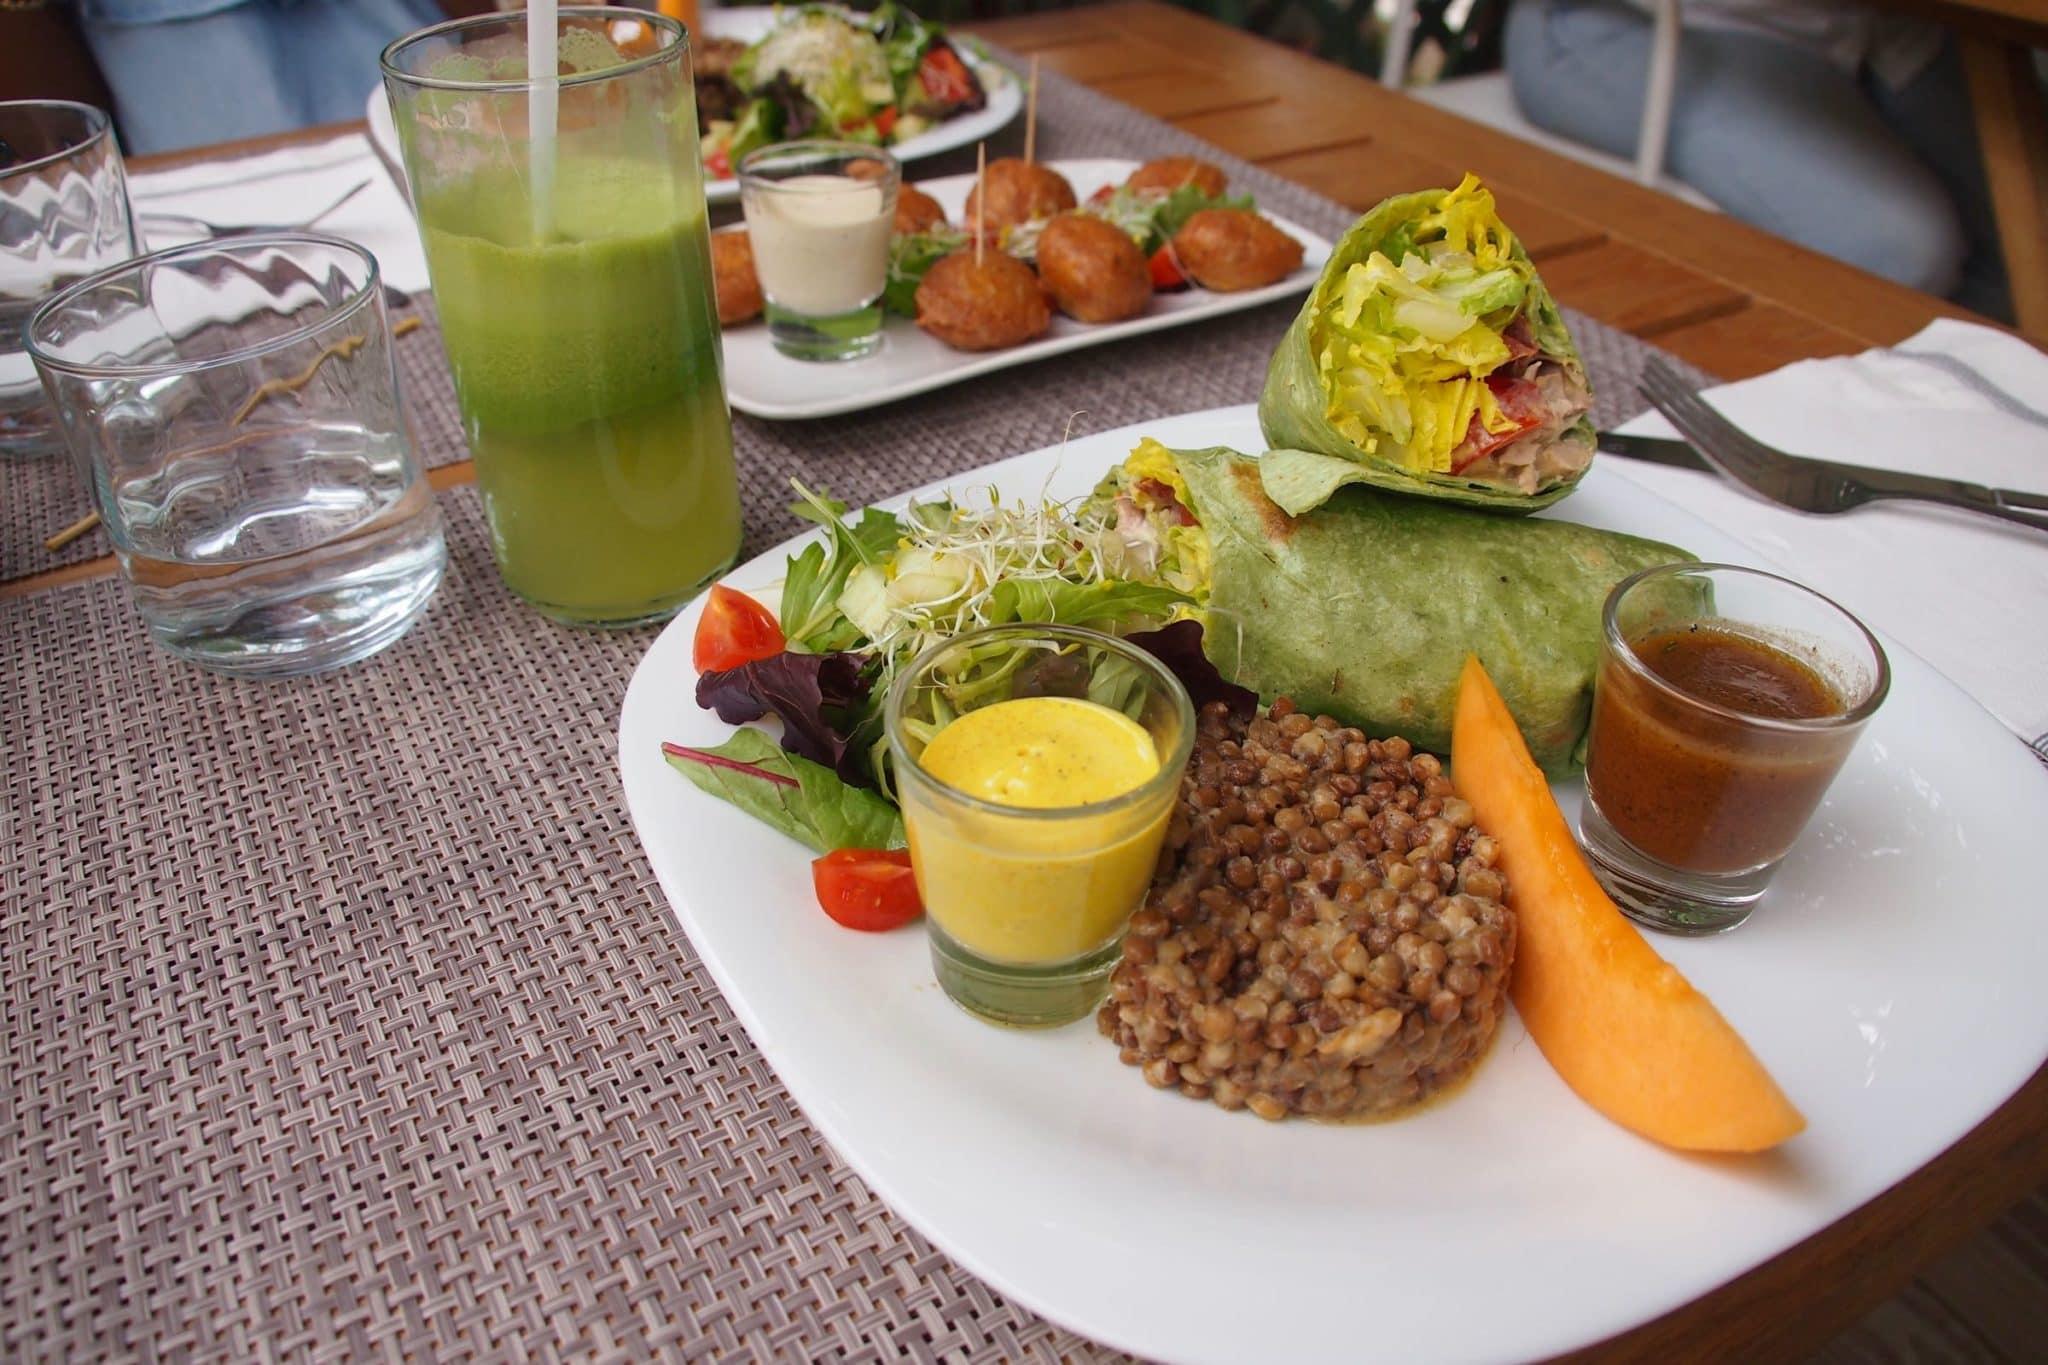 Fueling Up On Organic Eats and Treats at Natural Cafe, St. Martin